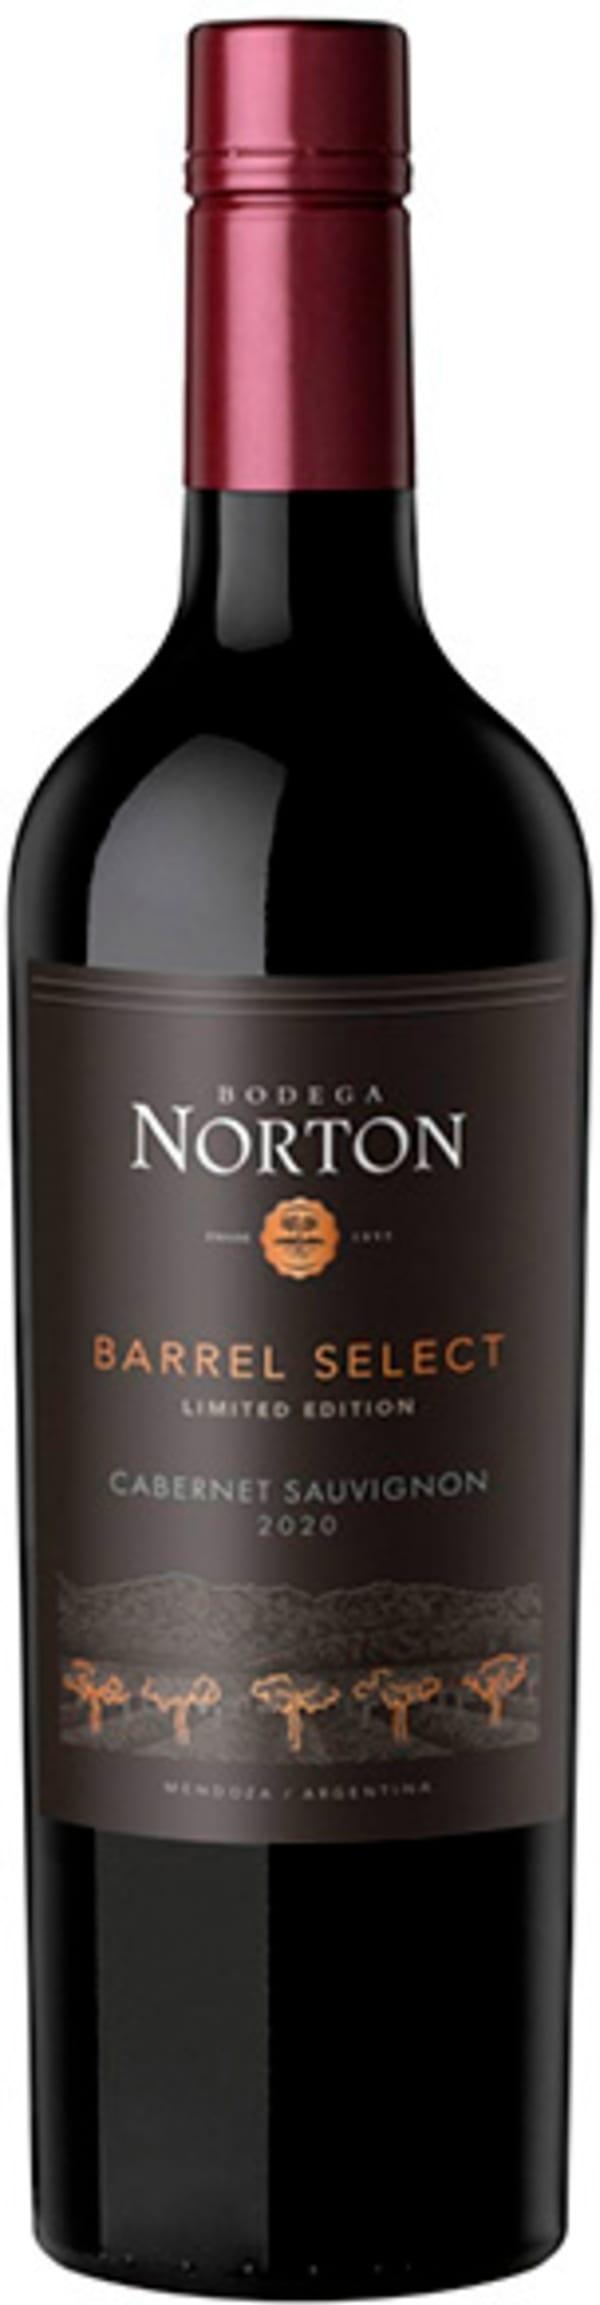 Norton Barrel Select Cabernet Sauvignon 2020